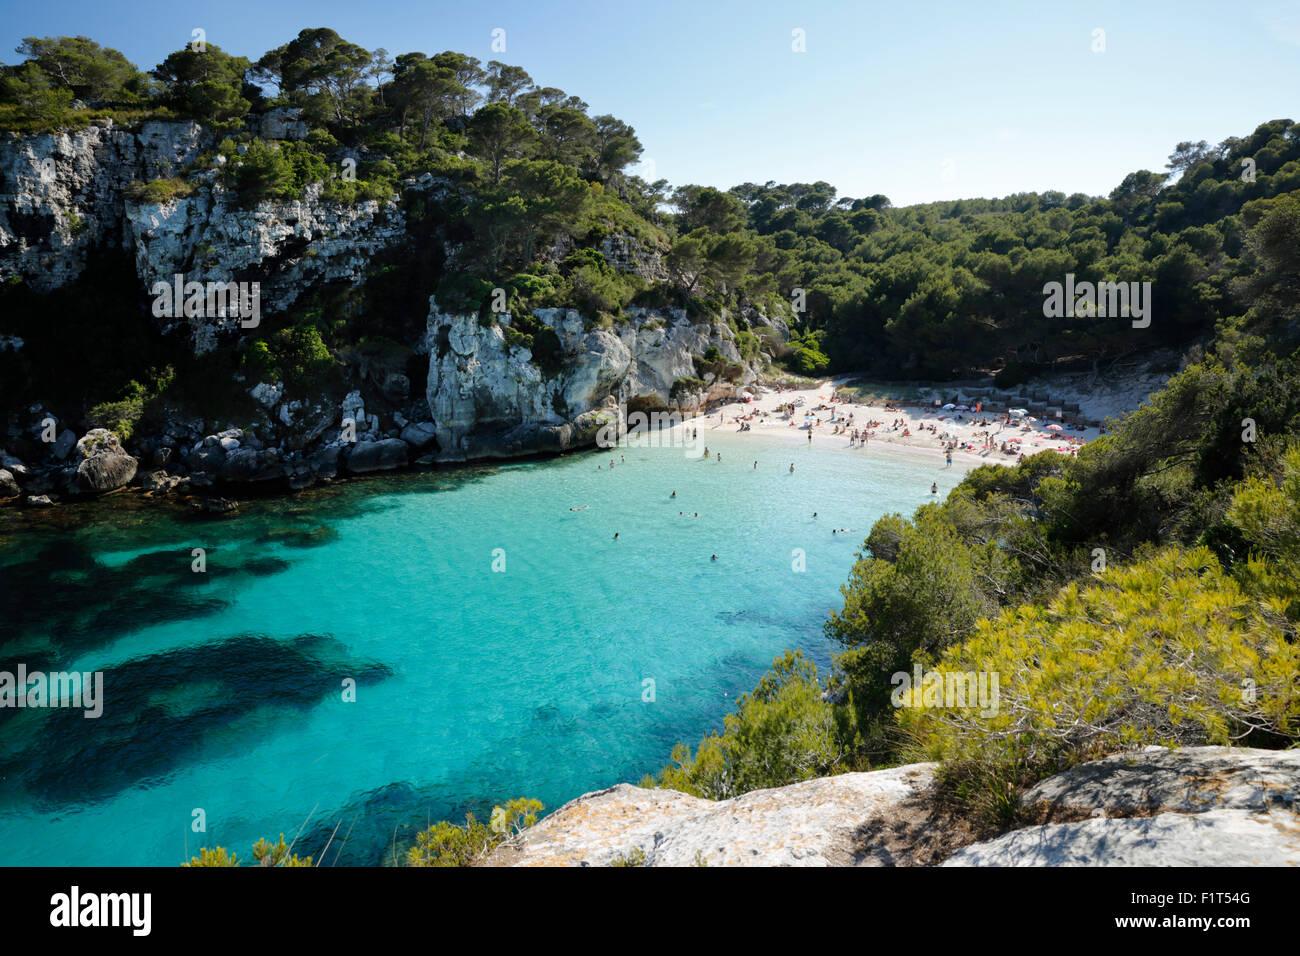 Cala Macarelleta, in der Nähe von Cala Galdana, Süd-West-Küste, Menorca, Balearen, Spanien, Mittelmeer, Stockbild